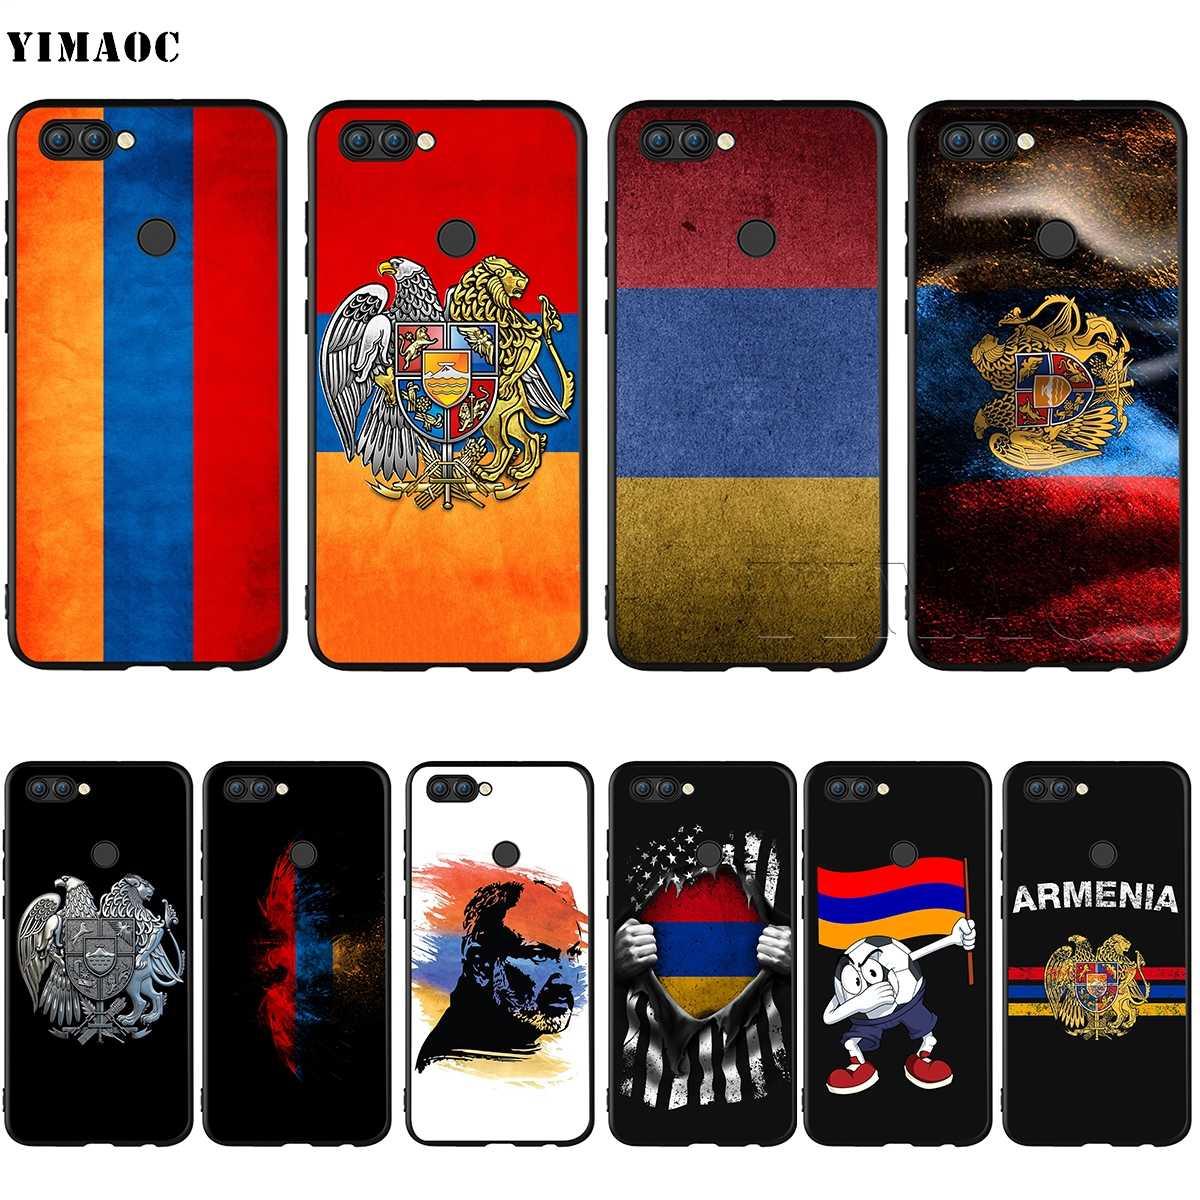 Yimaoc Армении армян чехол с флагом для huawei Коврики 30 20 Honor Y7 7a 7c 8c 8x9 10 Nova 3i 3 Lite рro Y6 2018 P30 P smart